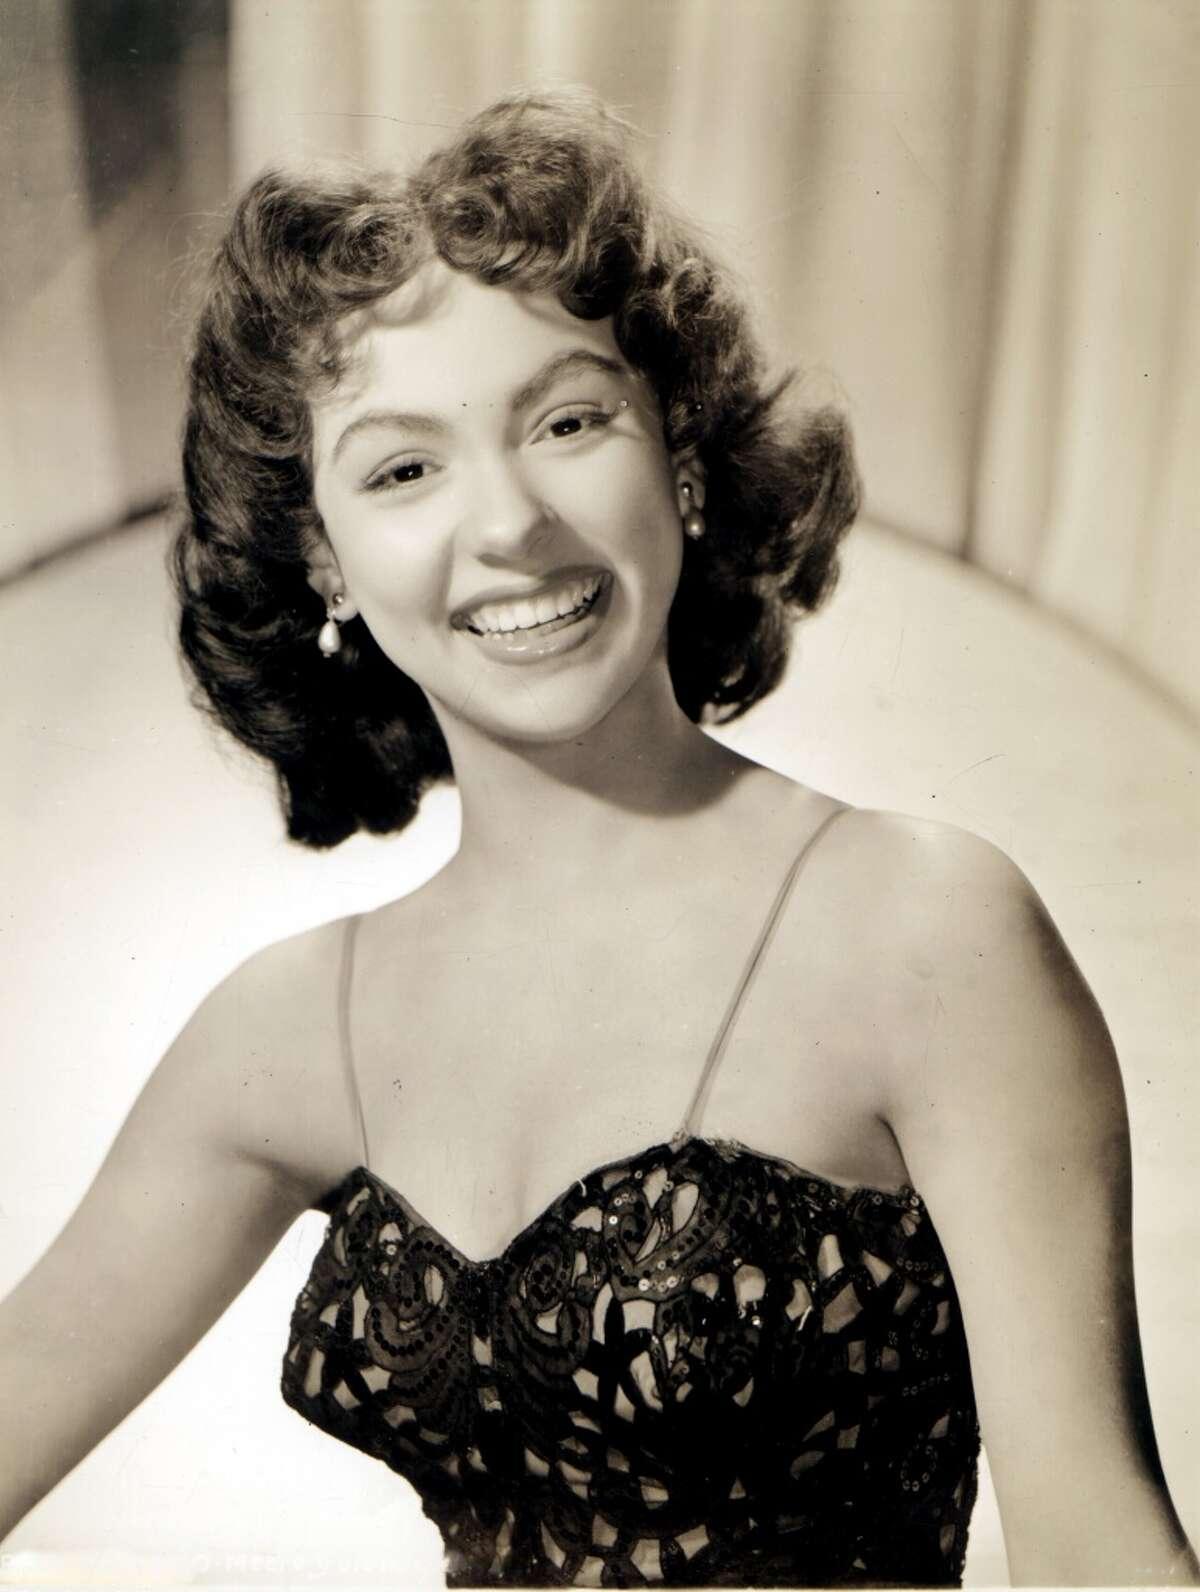 Photo of Puerto Rican actress and singer Rita Moreno posed circa 1950.